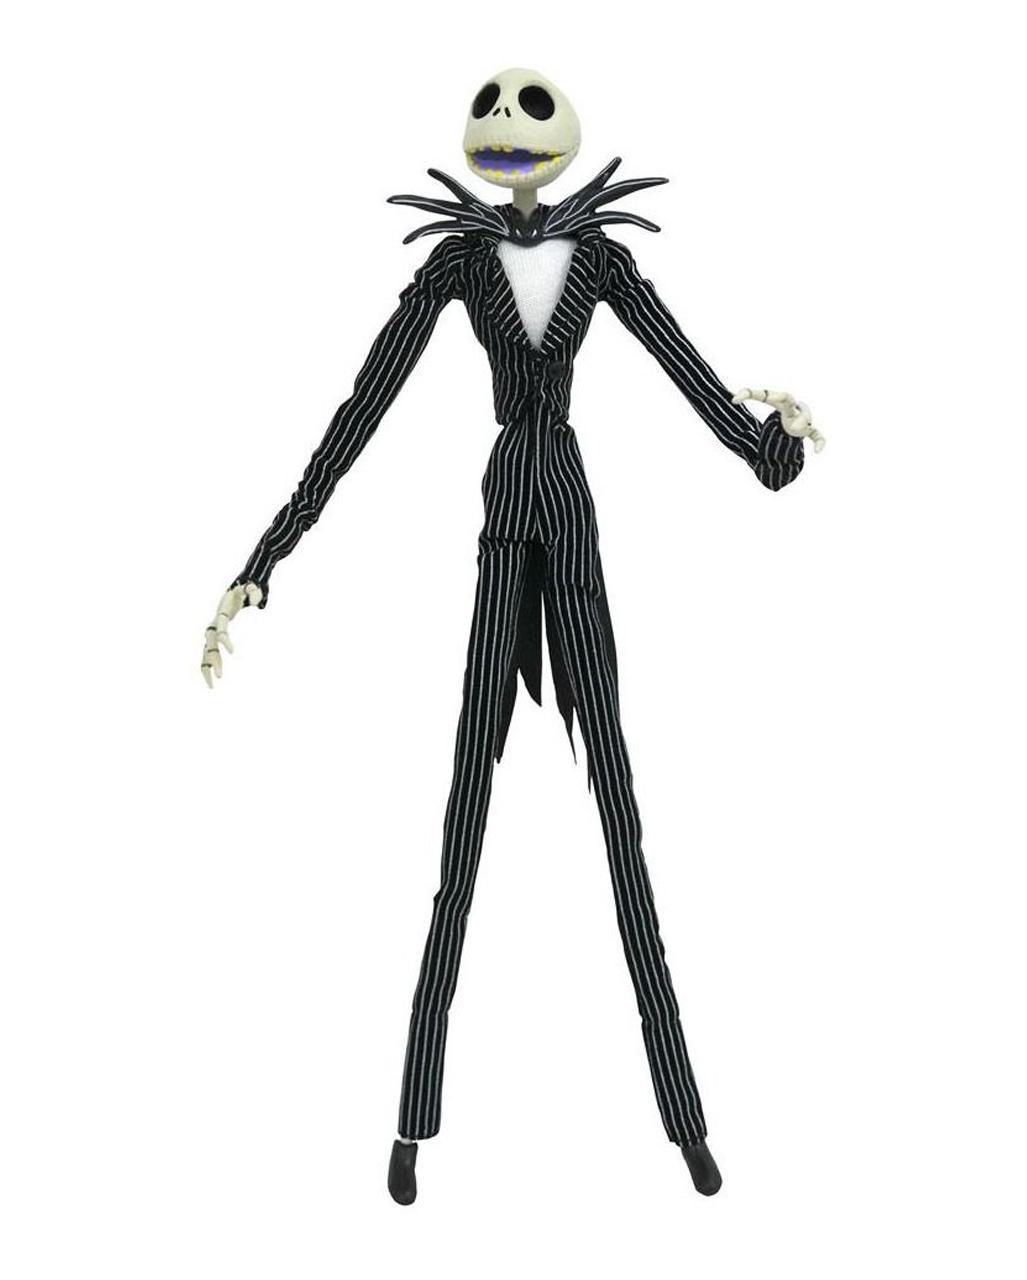 2a1eca3652146 Jack Skellington Nightmare Before Christmas Figure ➤ | horror-shop.com